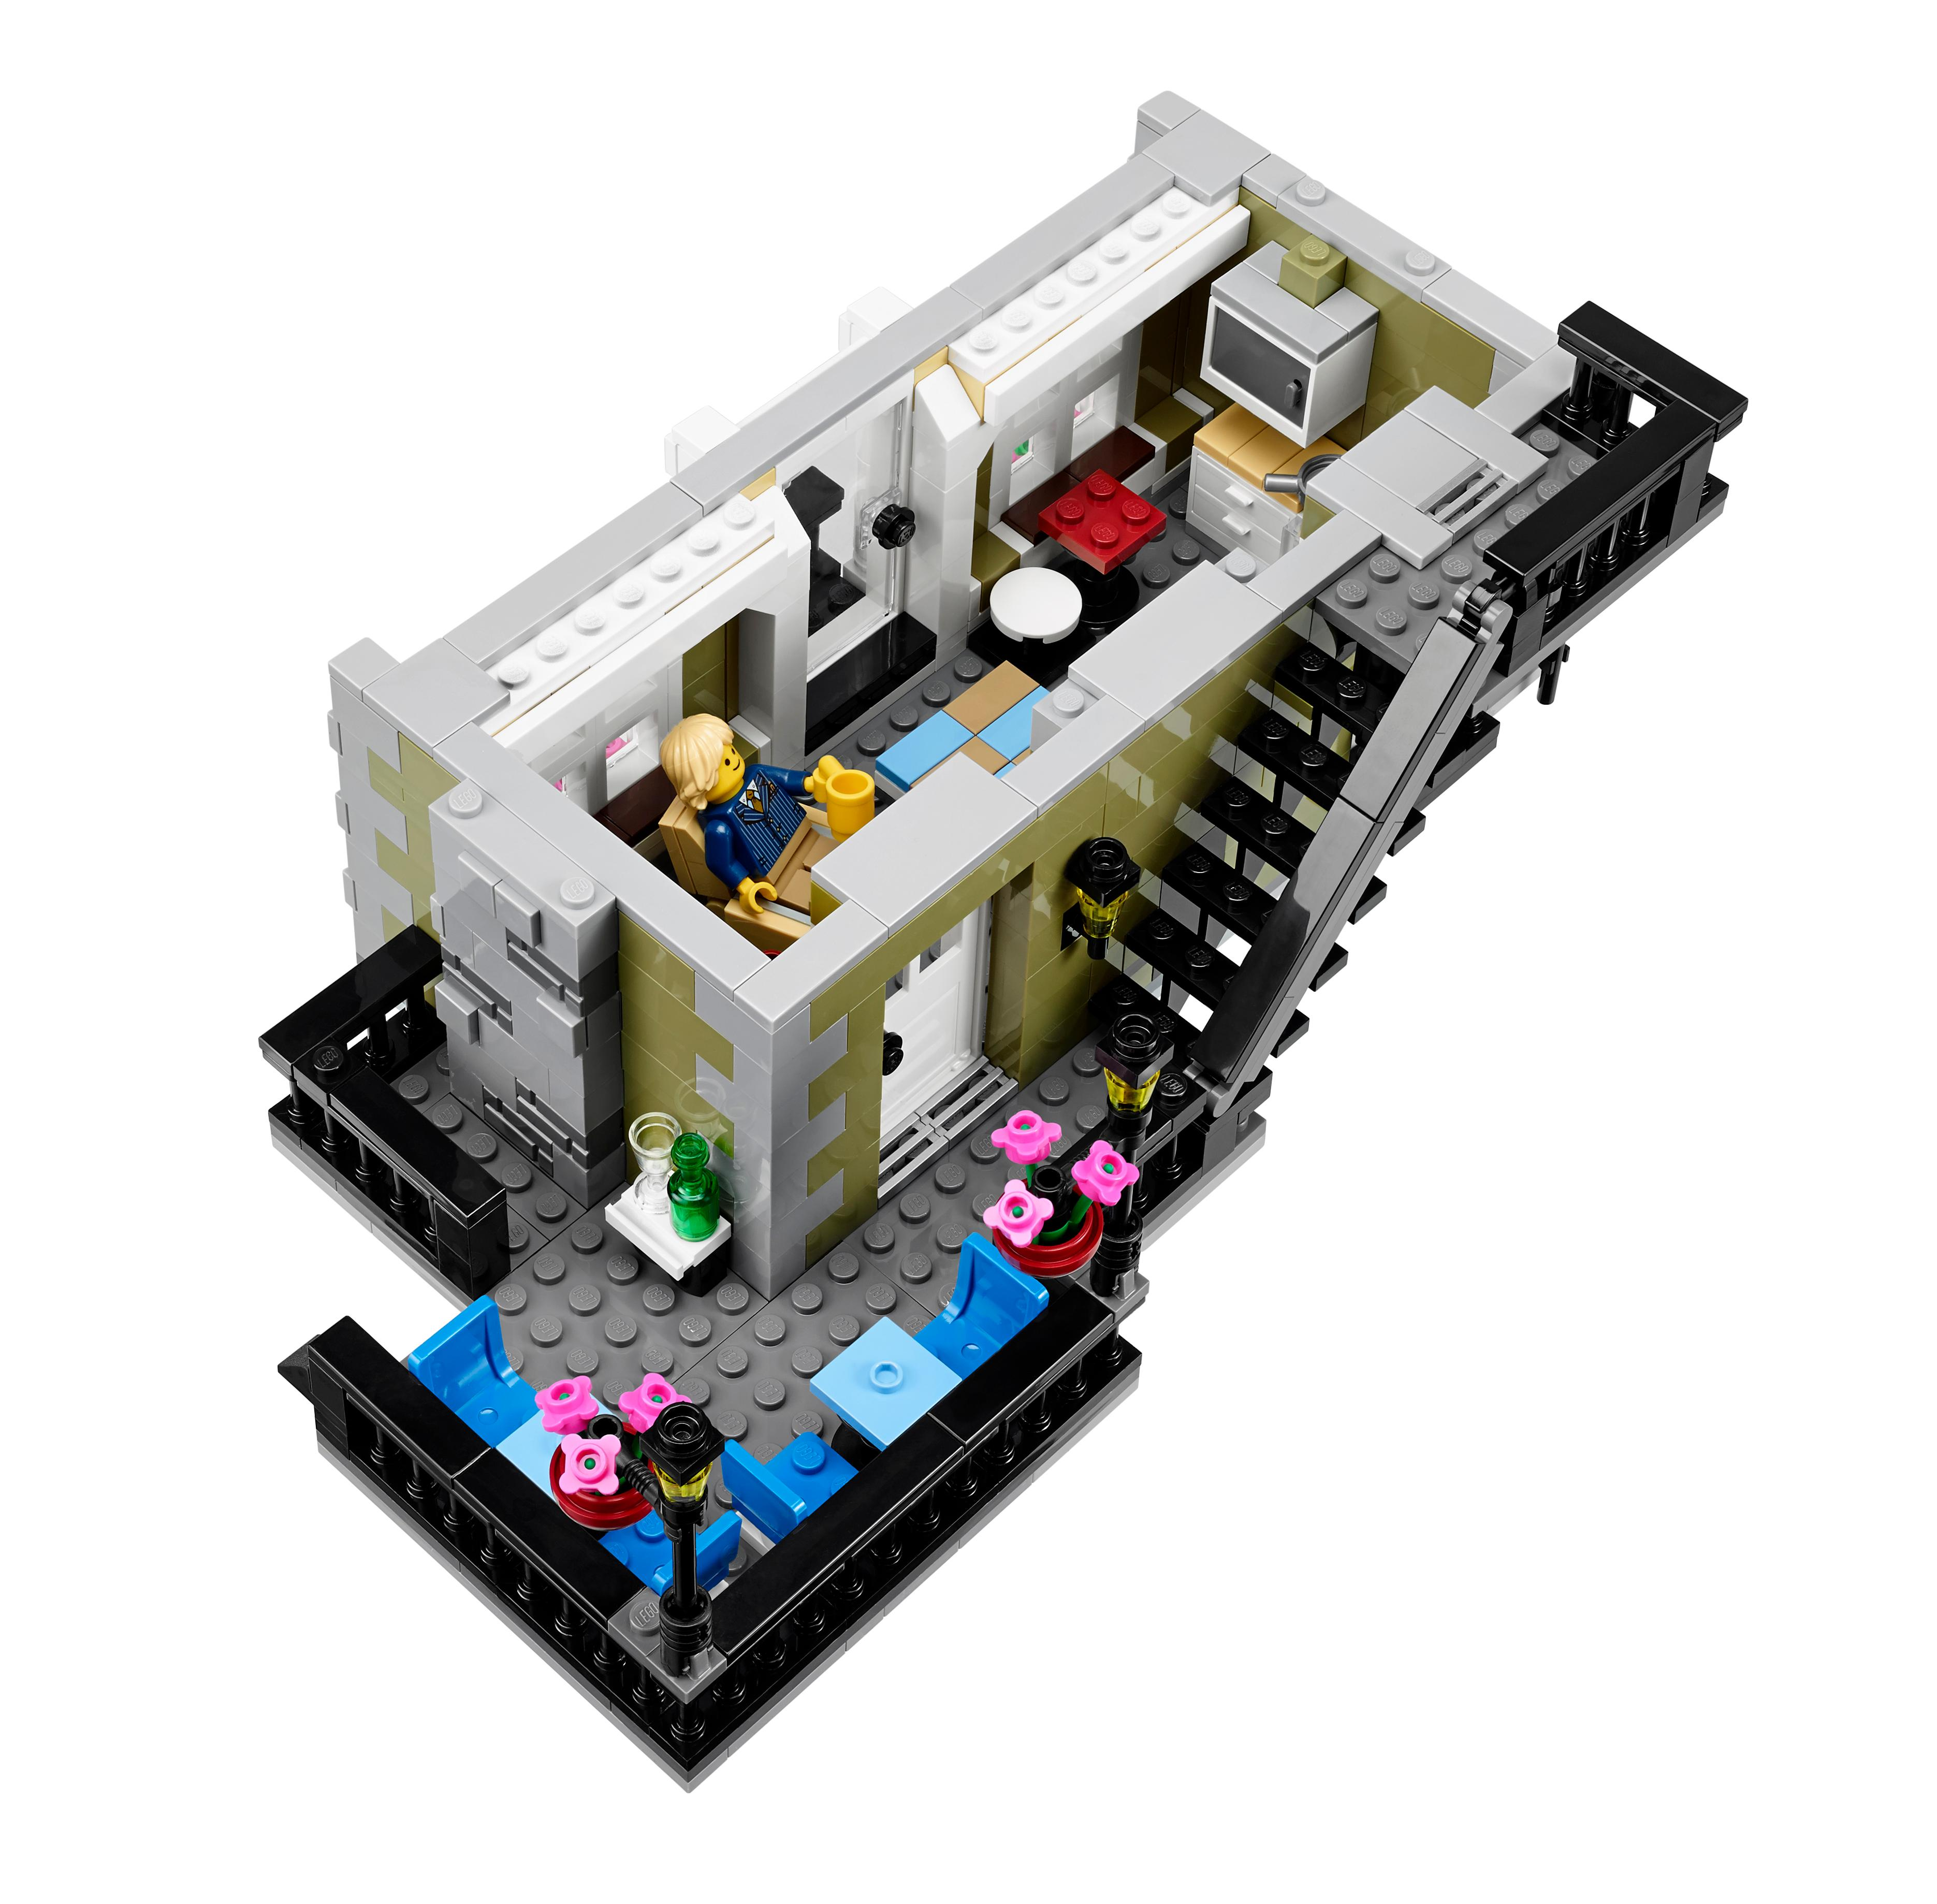 Amazoncom LEGO Creator Expert 10243 Parisian Restaurant  : d819220d 41ad 4c14 b22e 2914664fba6bjpgCB526179842 from www.amazon.com size 3741 x 3677 jpeg 637kB